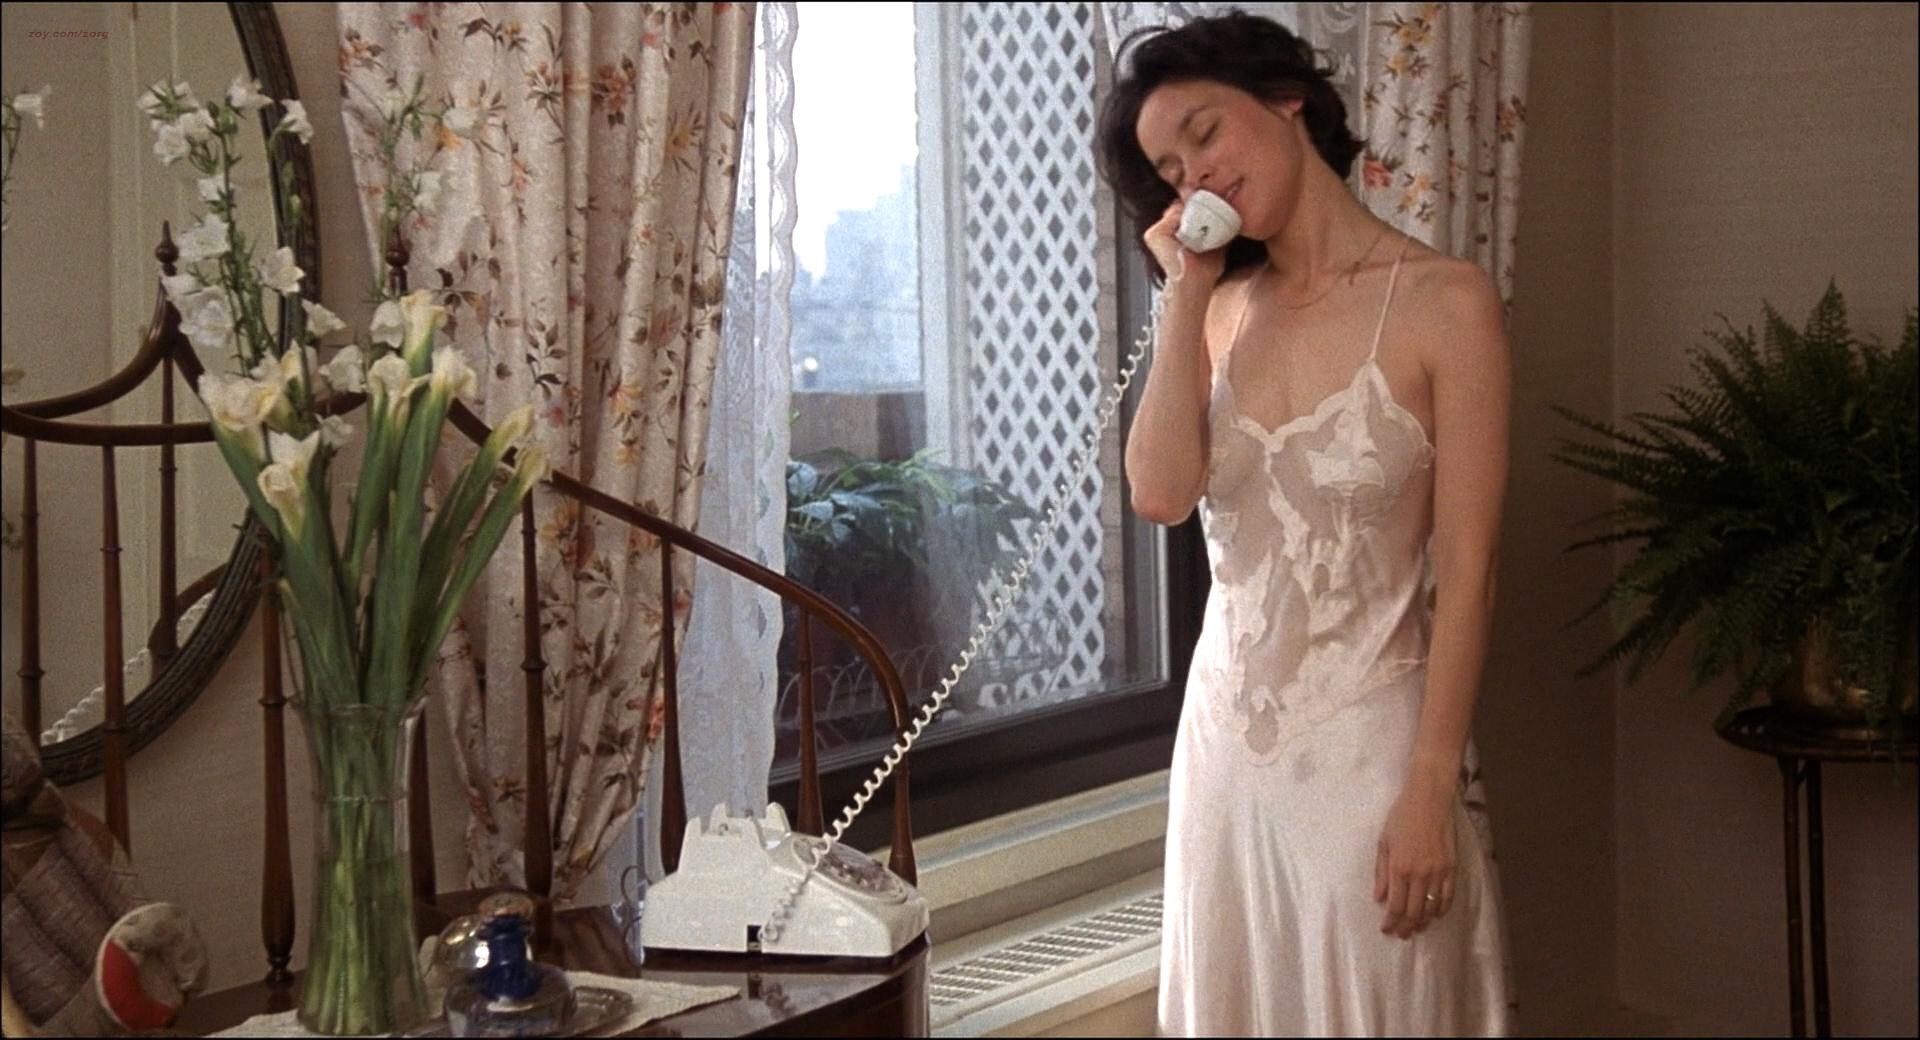 Kim Cattrall nude topless Meg Tilly hot sex Dana Delany hot bikini - Masquerade (1988) HD 1080p BluRay (1)